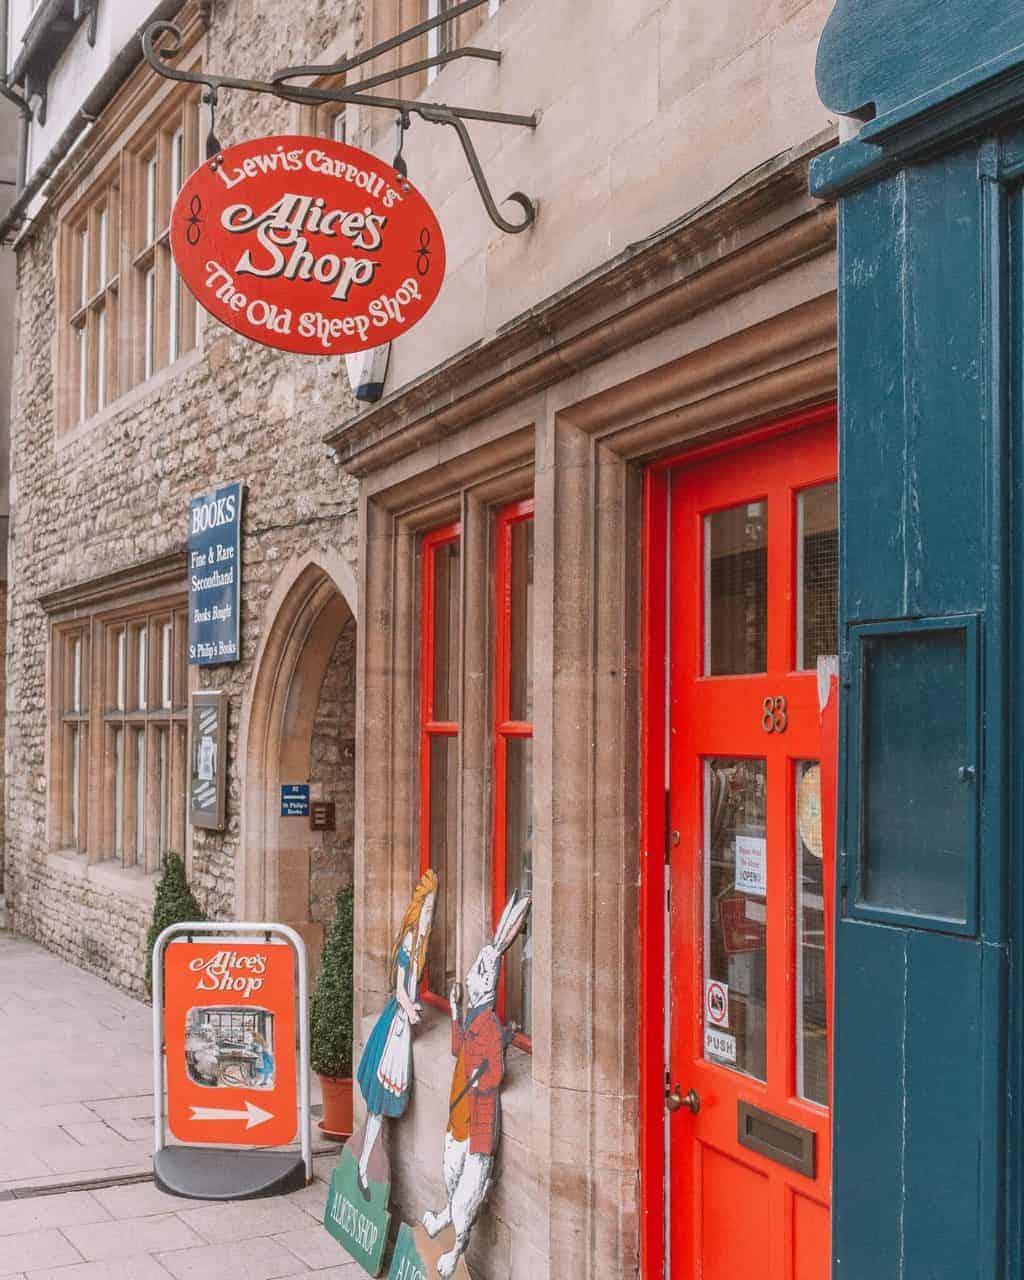 Ultimate Guide to Alice in Wonderland in Oxford #whatshotblog